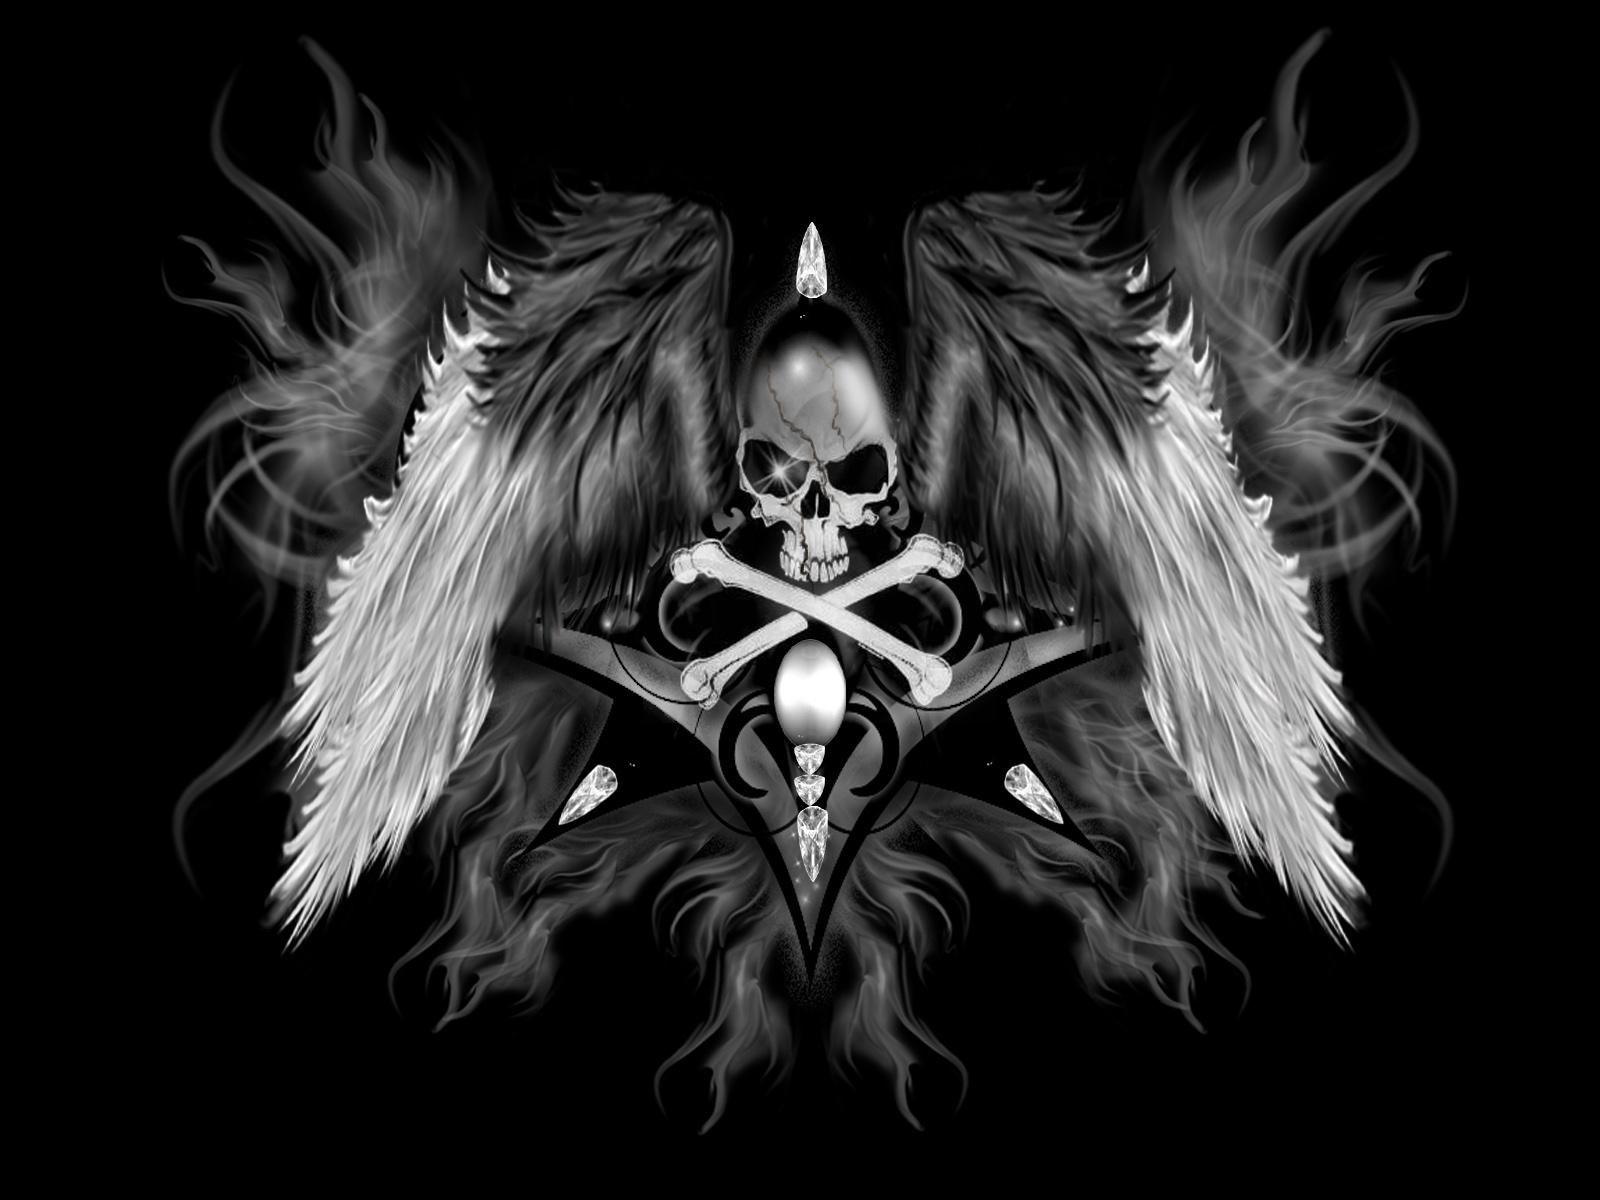 Death Dark Angels Wallpaper Dark Forces Backgrounds